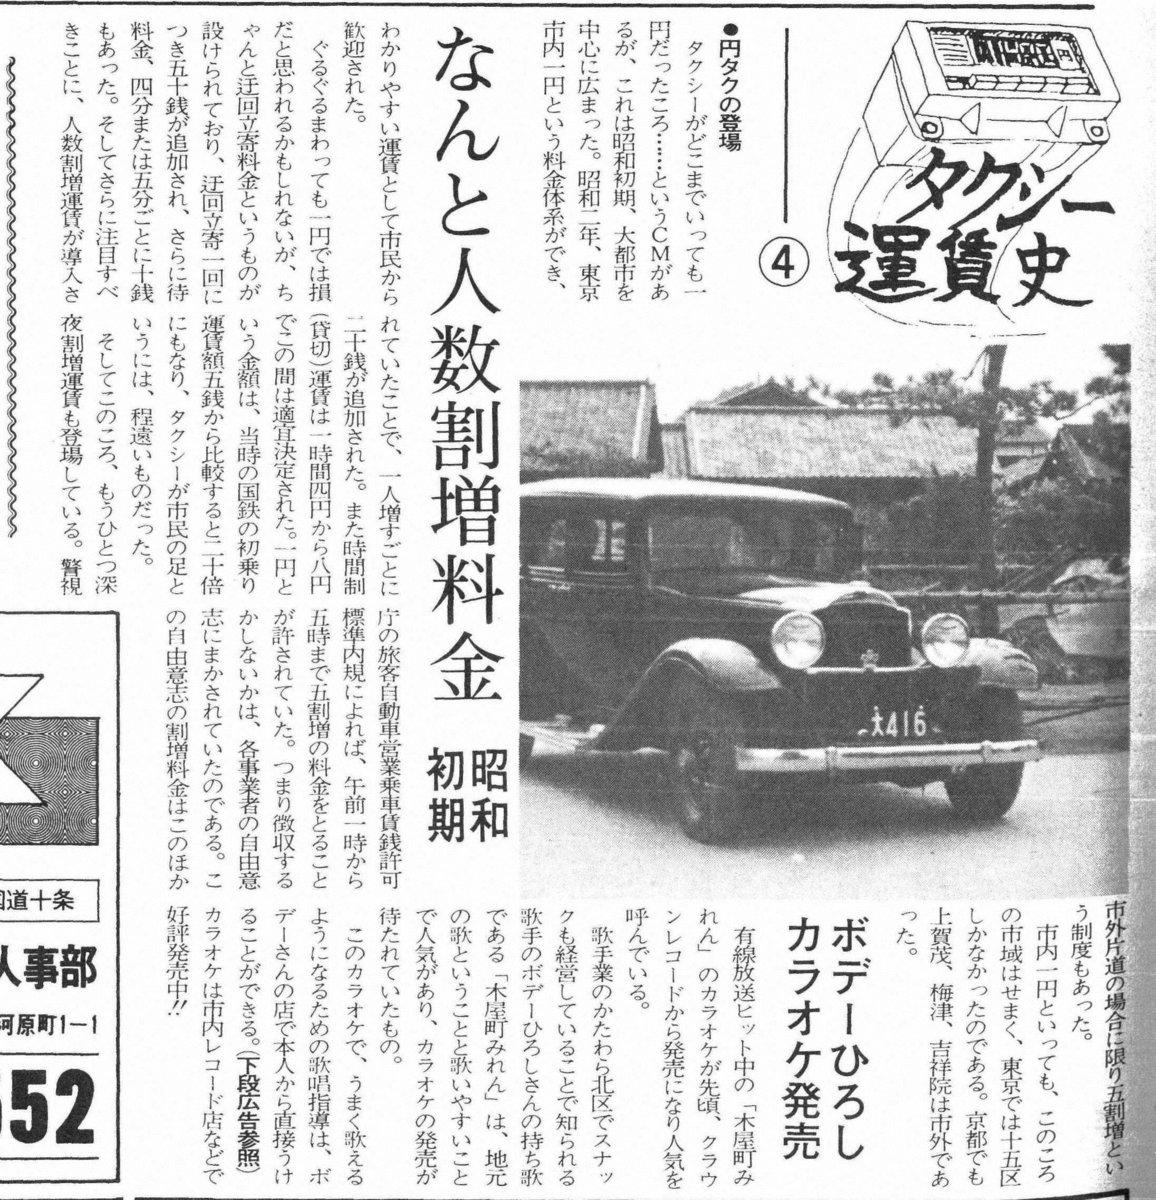 MK新聞 1982年7月16日号 掲載